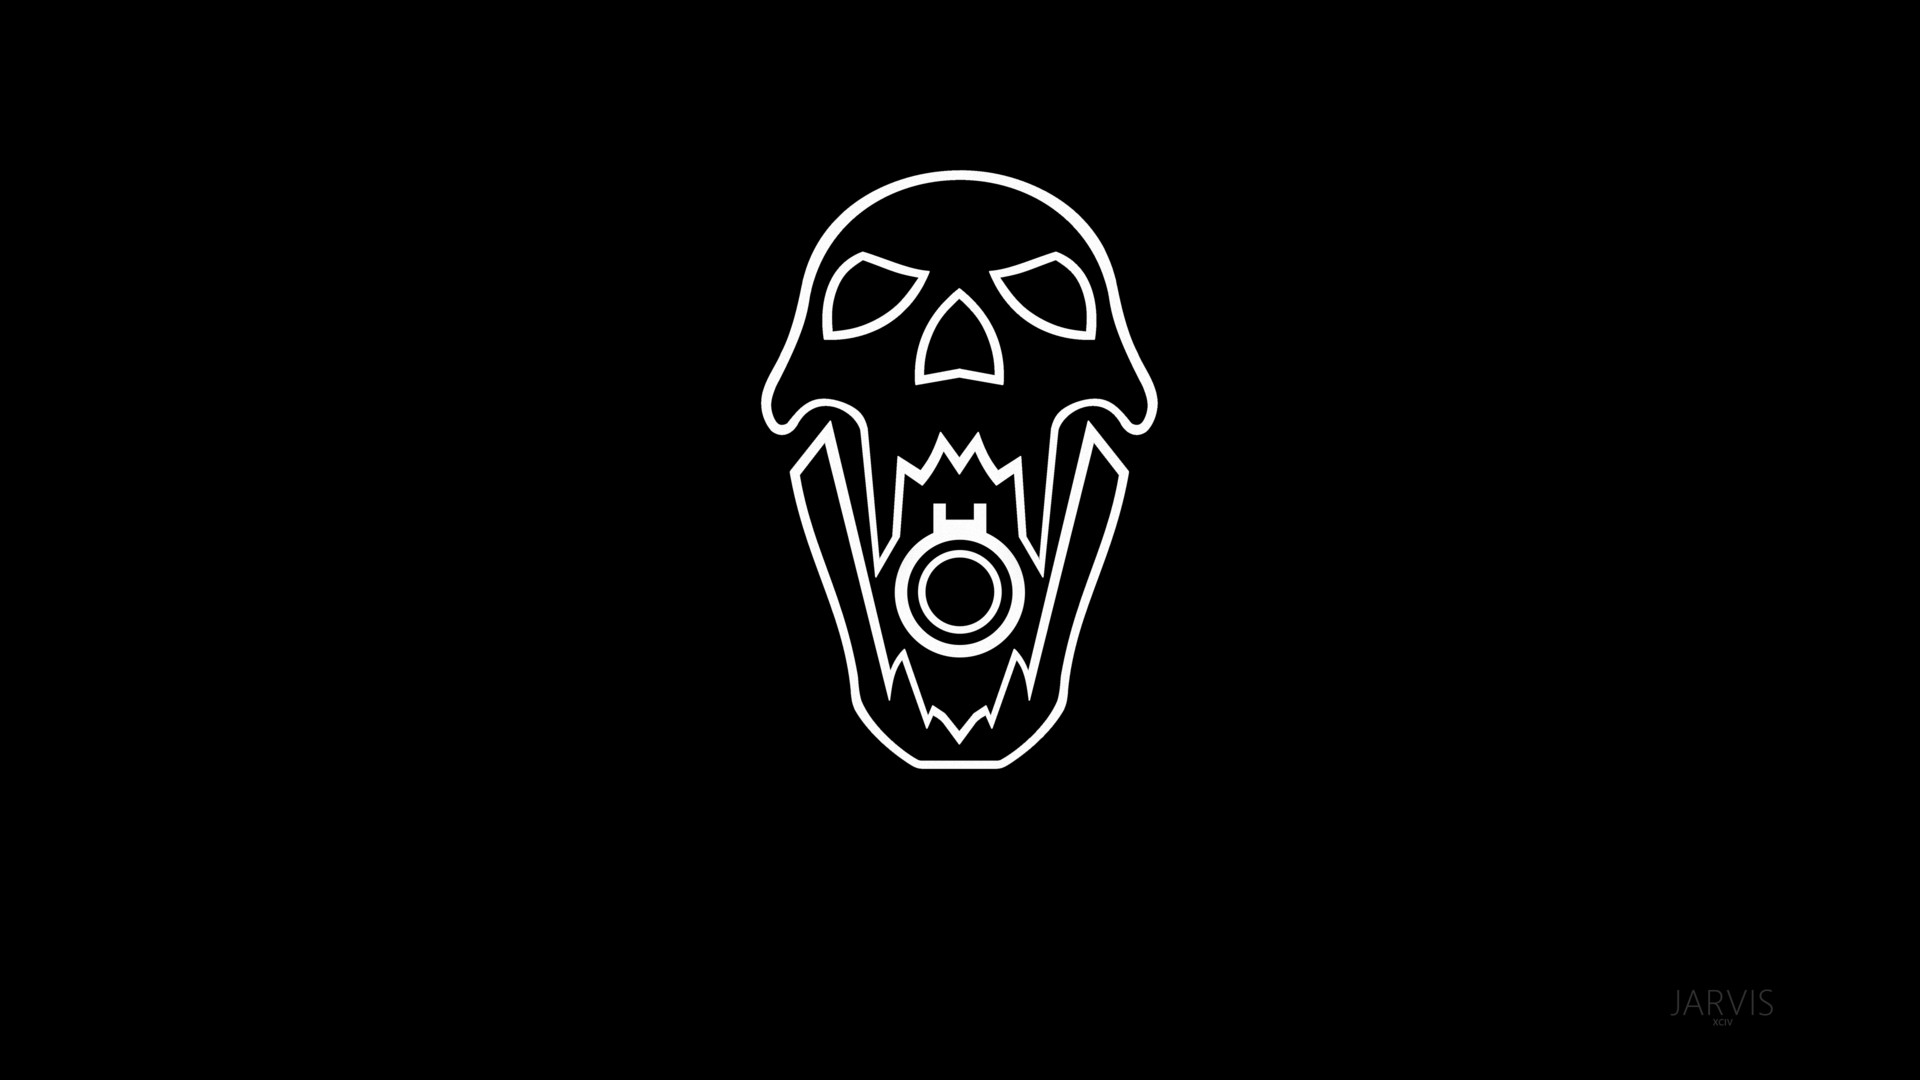 Artstation Blackbeard Icon Wallpaper Pack Jarvis Xciv